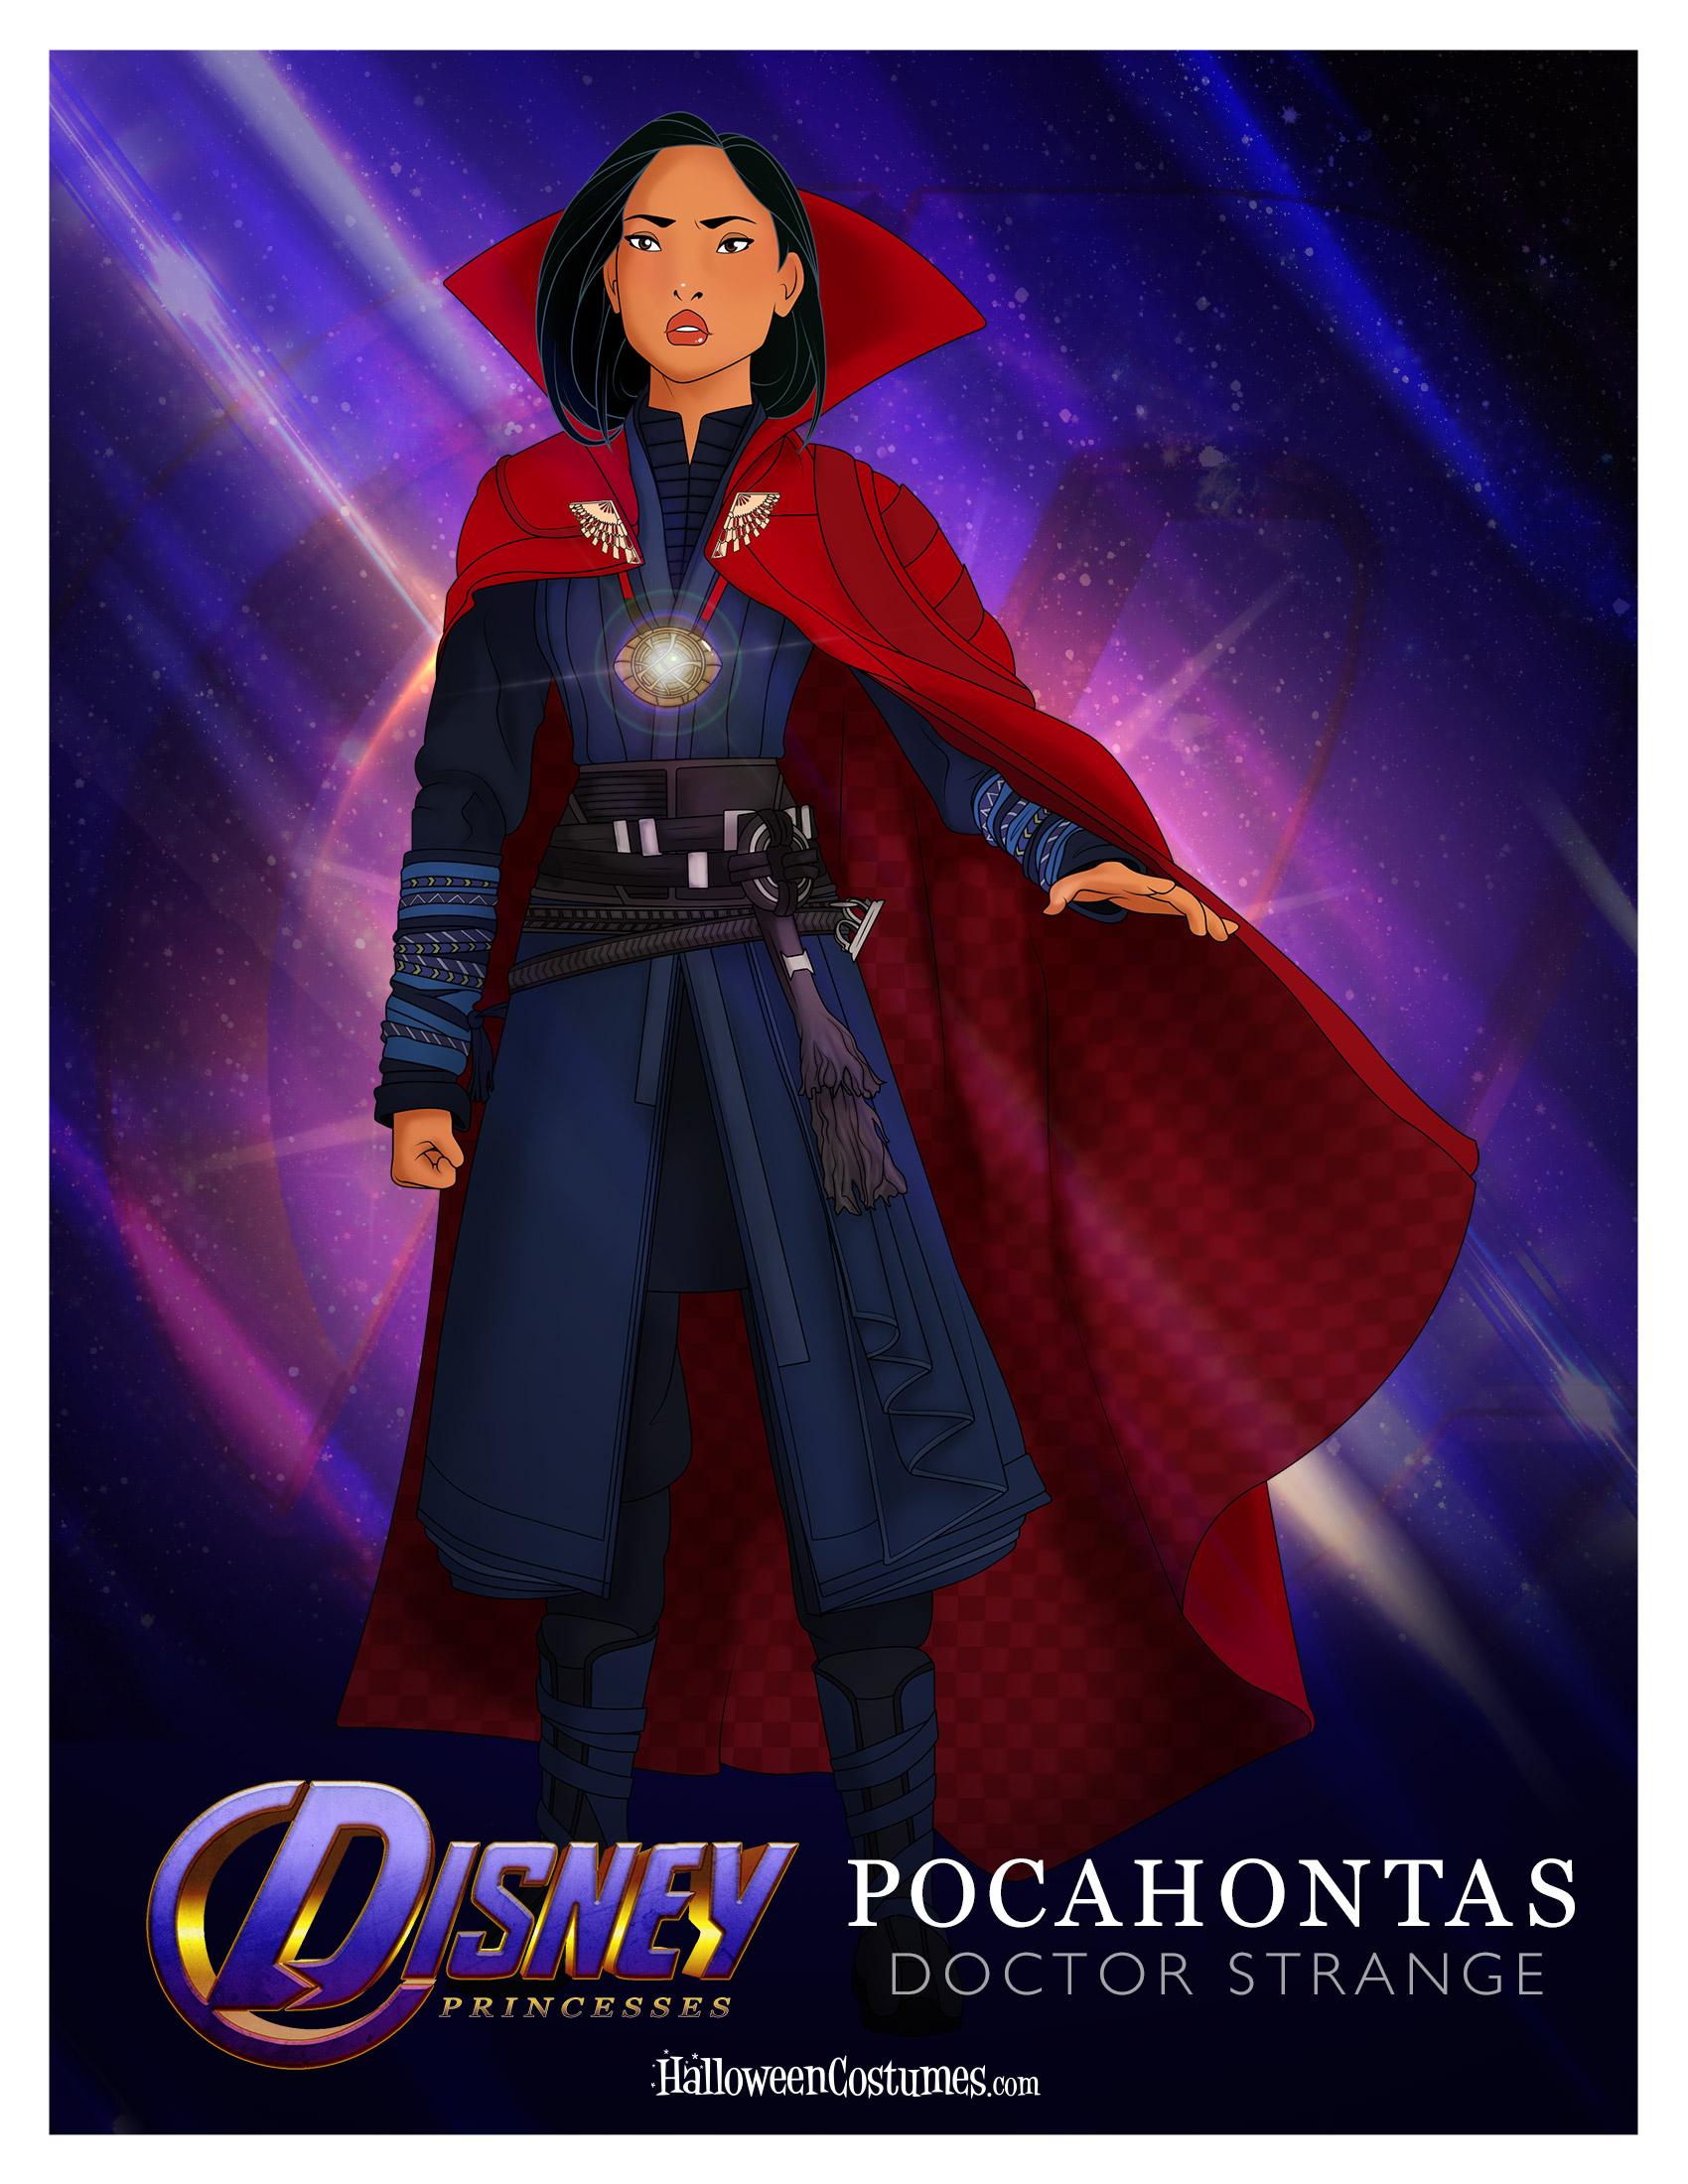 Princess Pocahontas as Doctor Strange